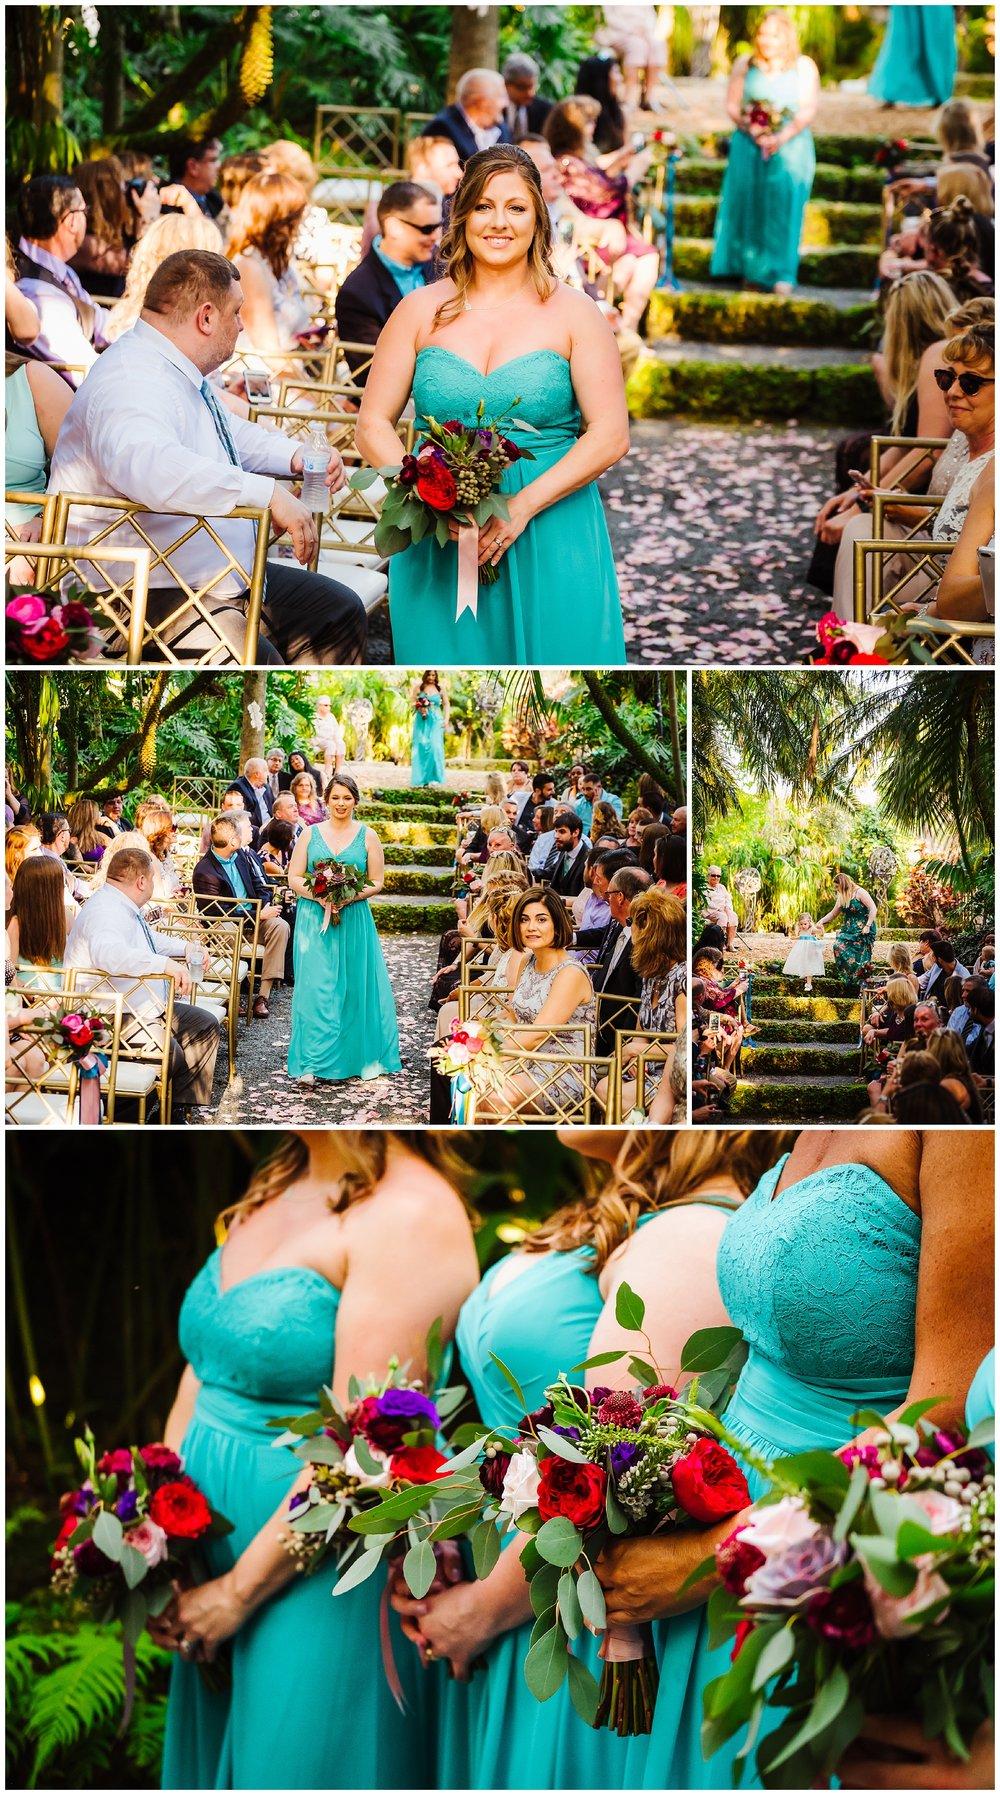 florida-destination-wedding-photographer-enchanted-tropical-miami-homestead-cooper-estate-teal_0043.jpg